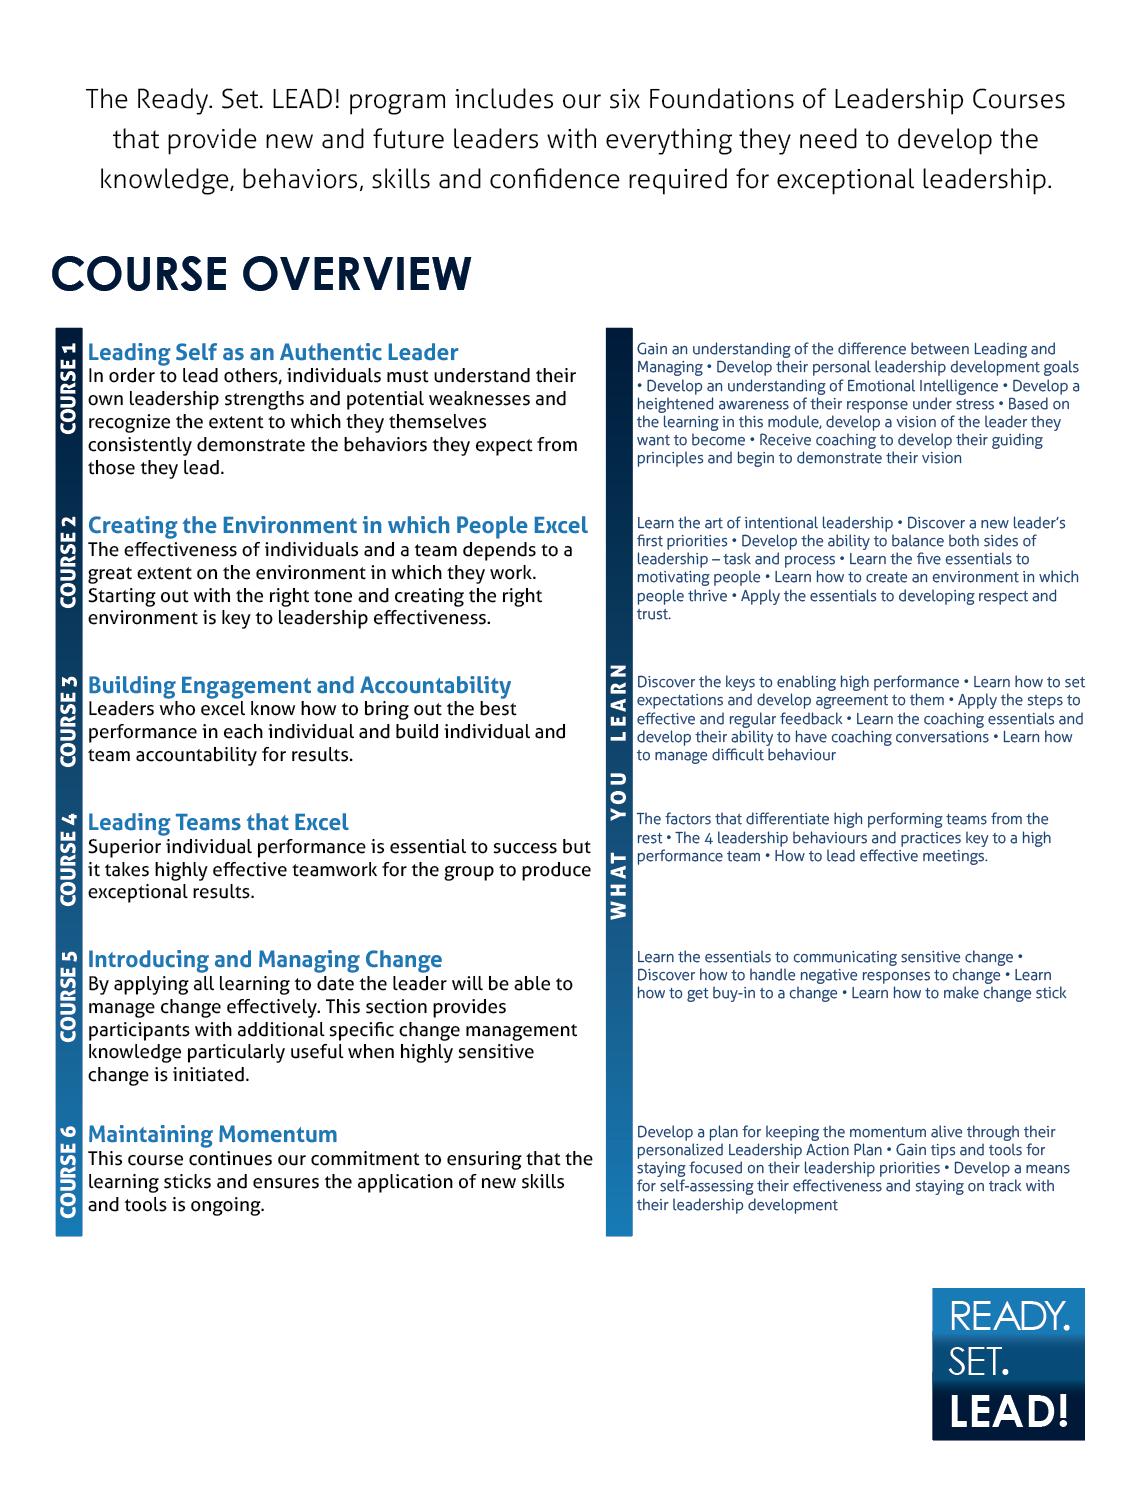 Workbooks success principles workbook : McCalden Designs - Course Branding, Brochure and Workbook Cover Design